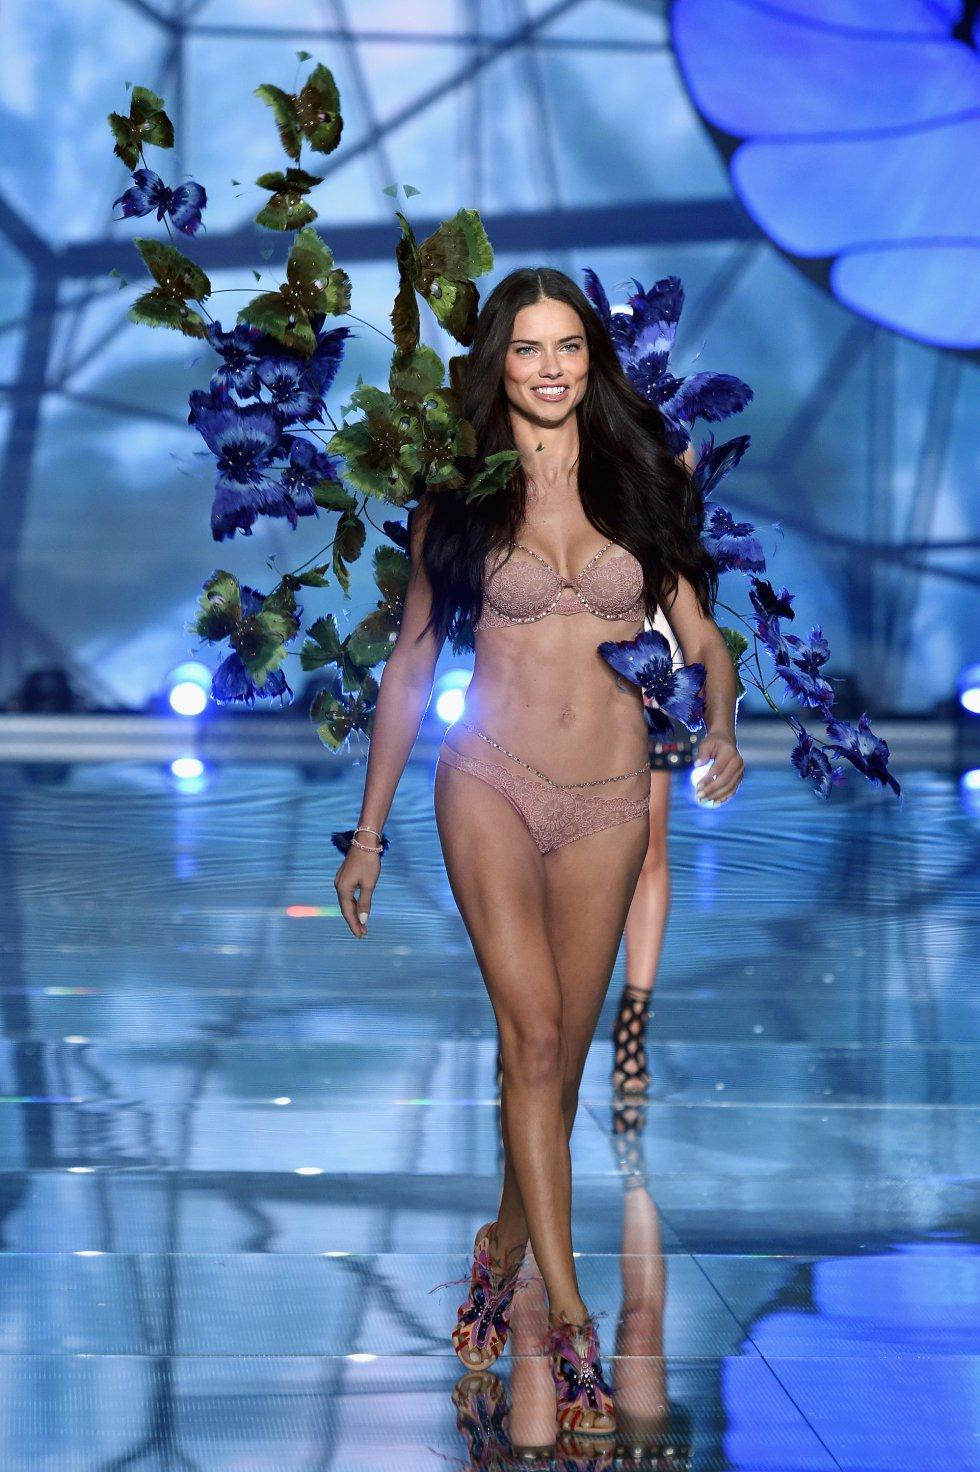 Victoria's Secret, november 10, 2015 en New York.